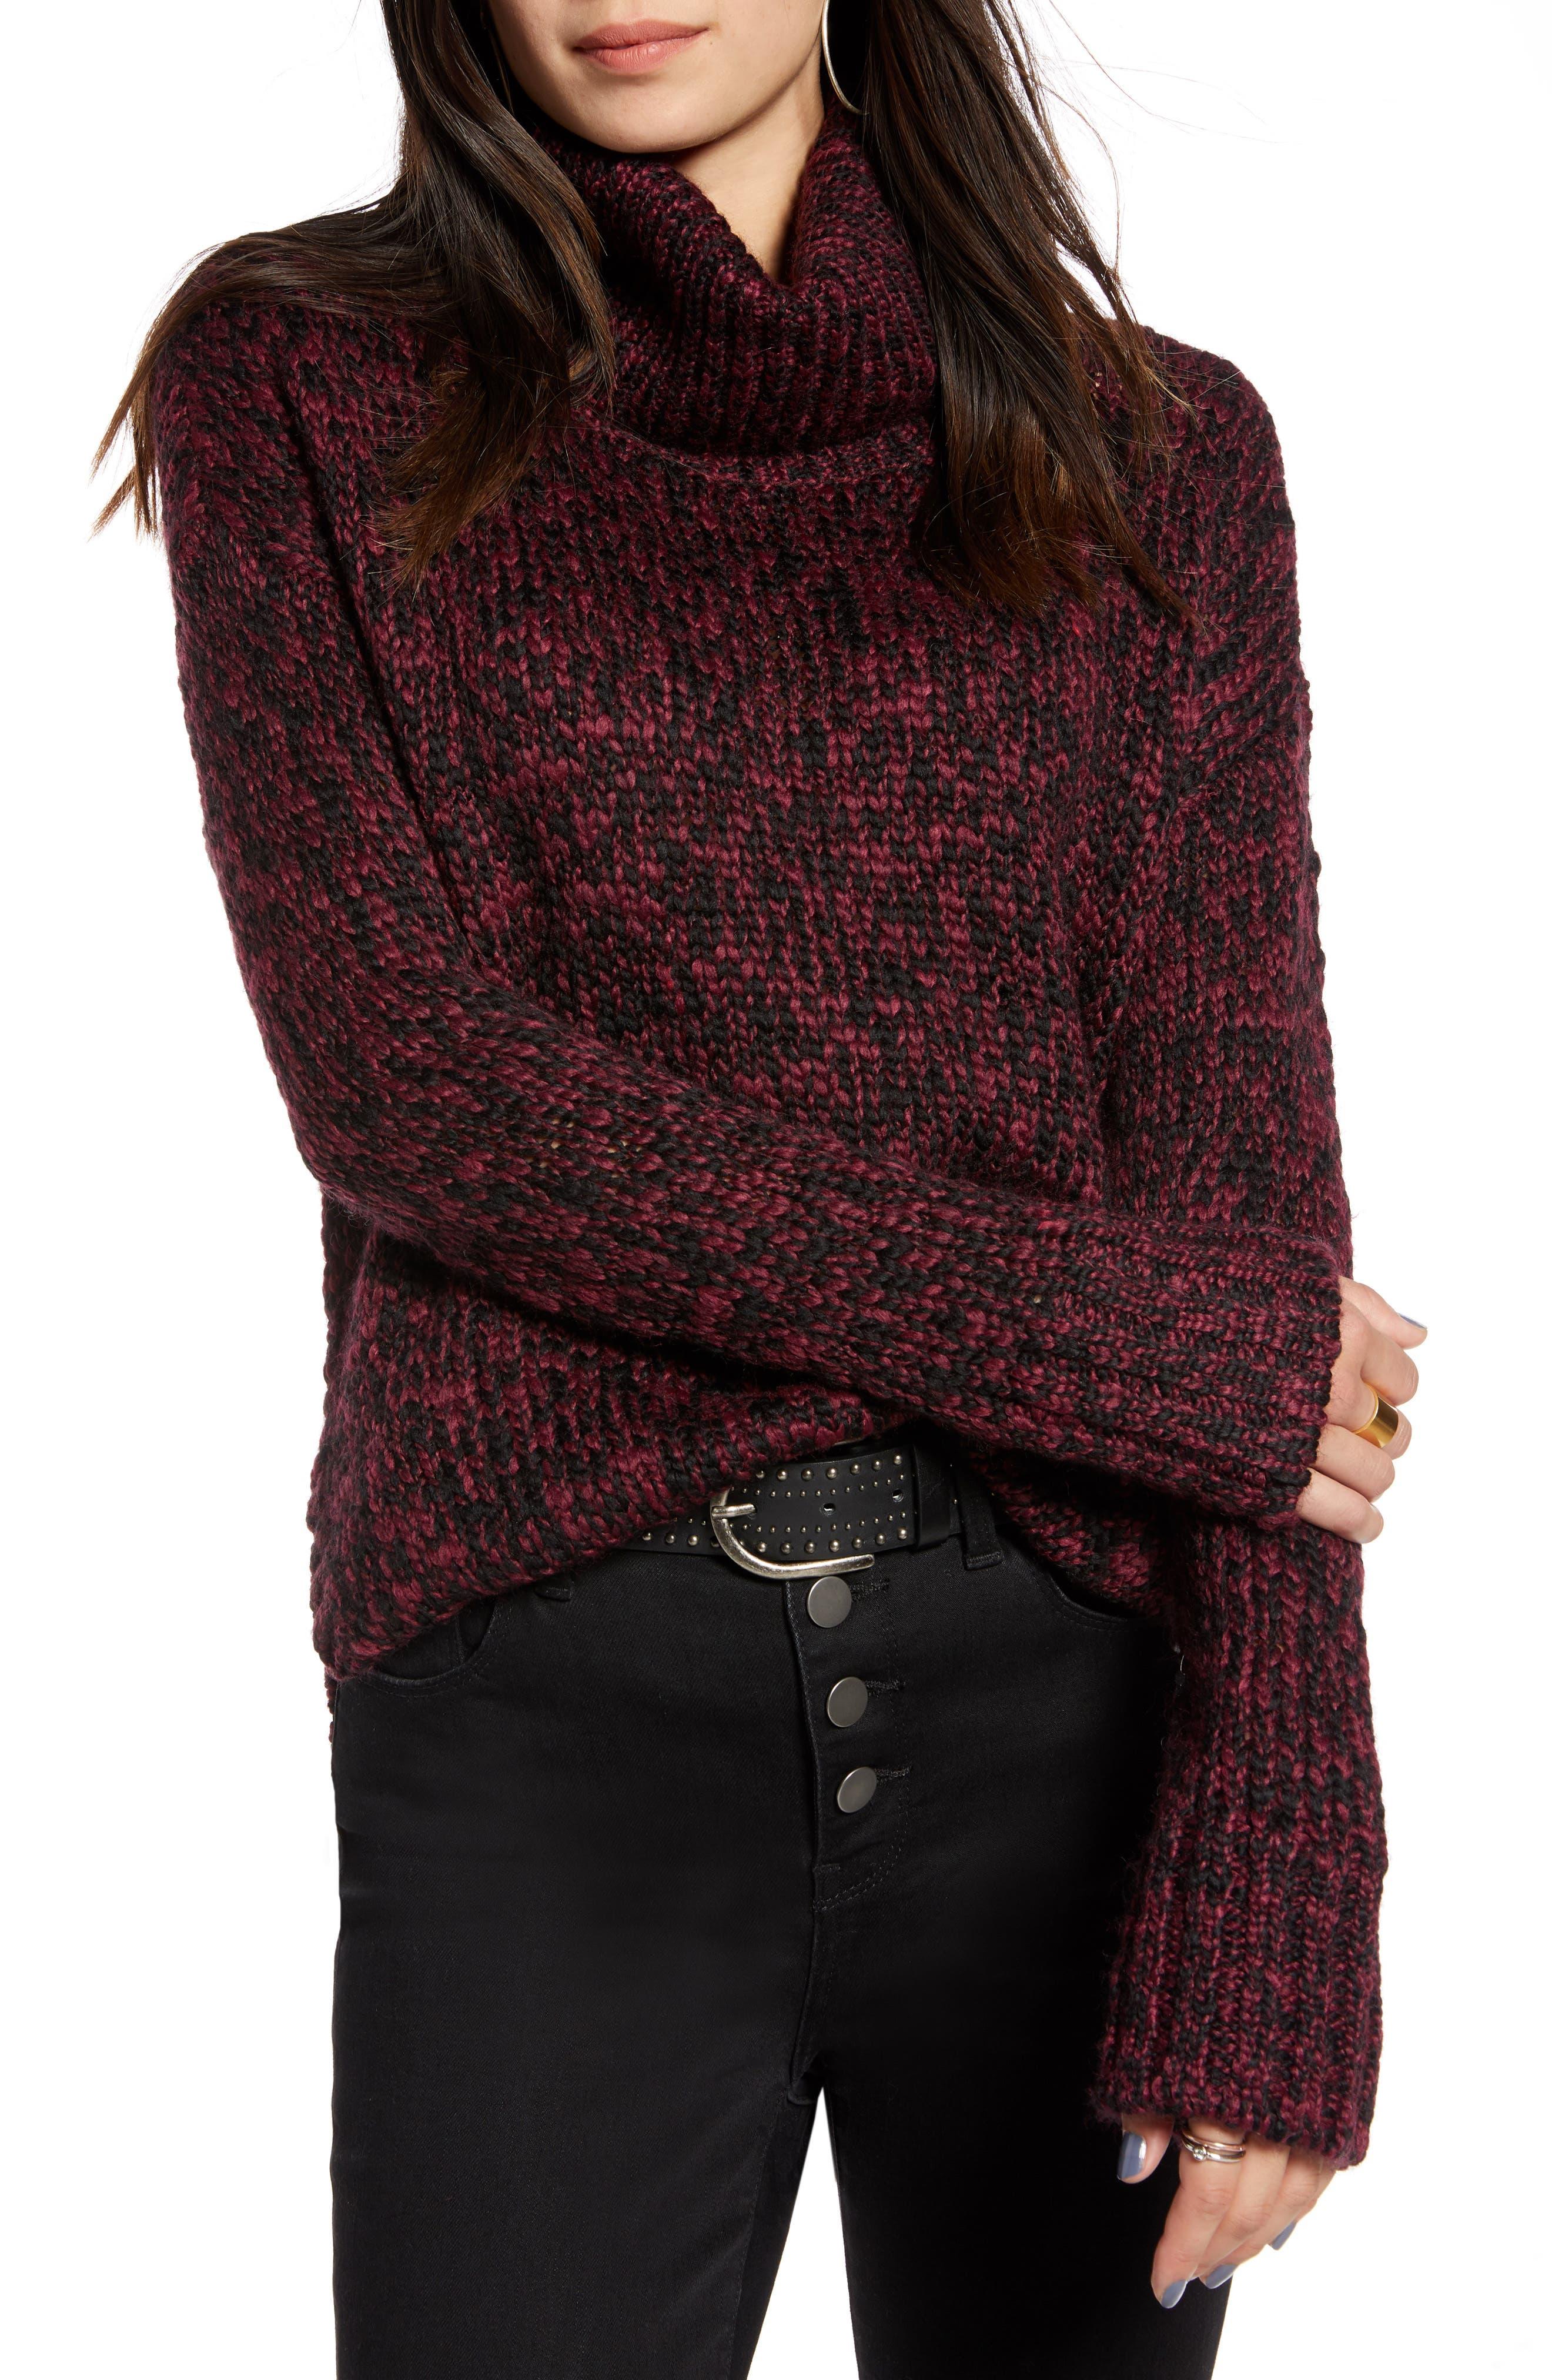 Treasure & Bond Turtleneck Sweater